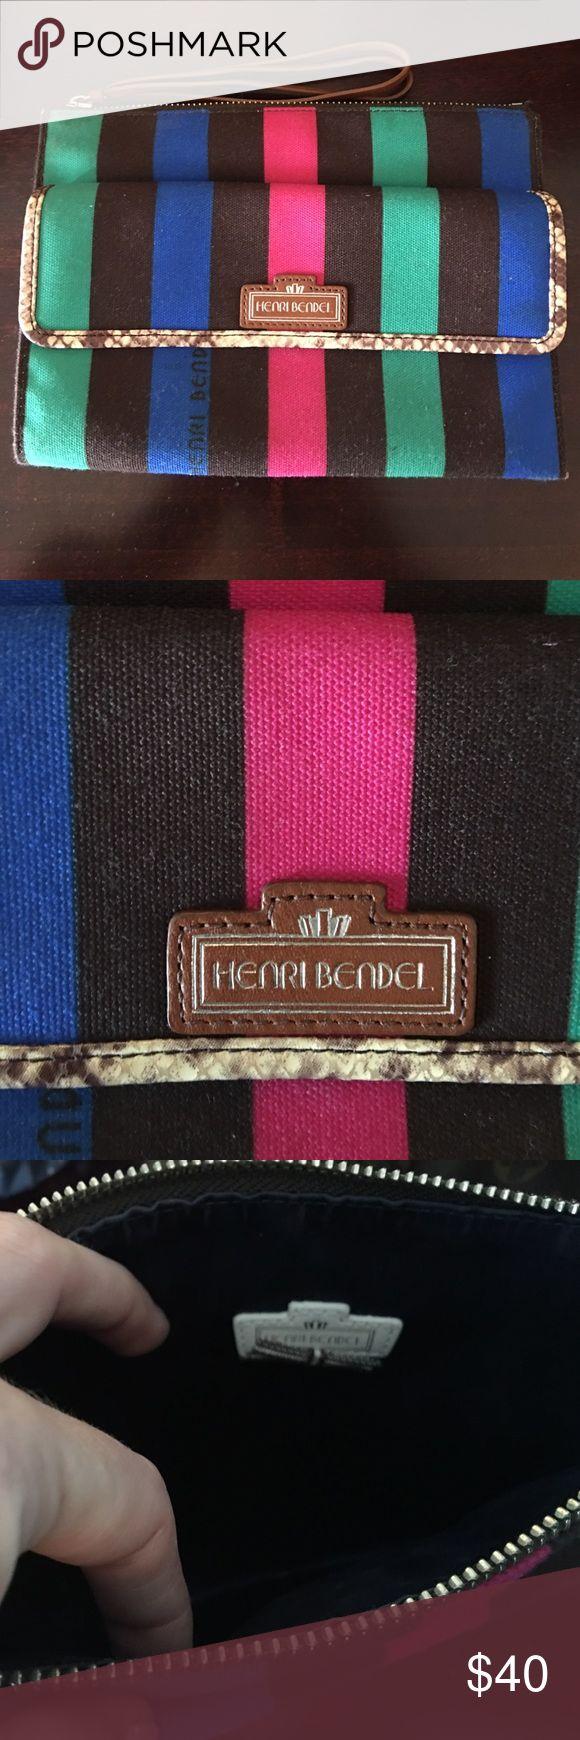 Henri bendel wristlet medium sized Henri bendel wristlet medium sized Bags Clutches & Wristlets